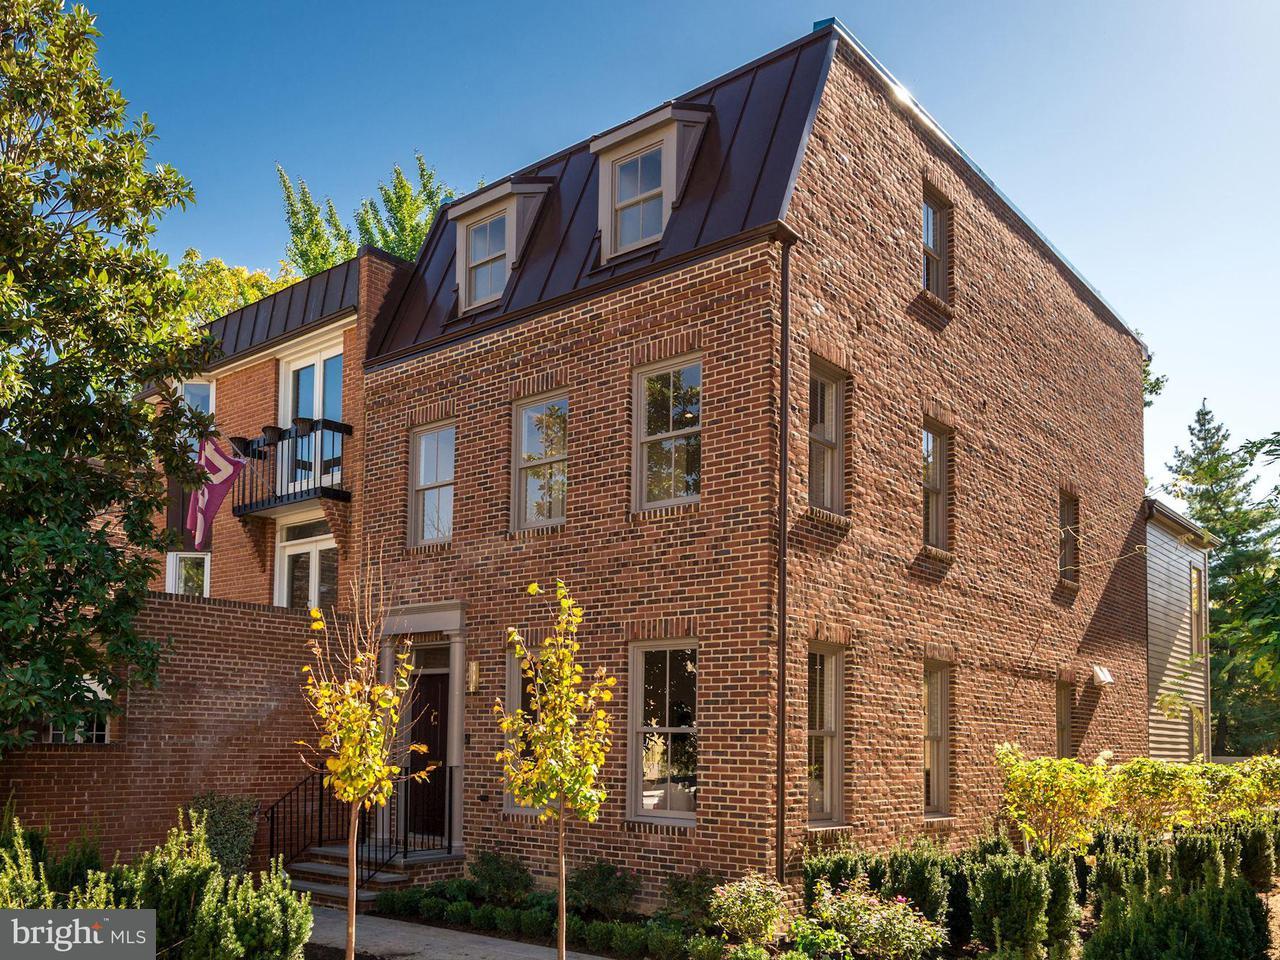 Casa unifamiliar adosada (Townhouse) por un Venta en 3324 Dent Pl Nw 3324 Dent Pl Nw Washington, Distrito De Columbia 20007 Estados Unidos